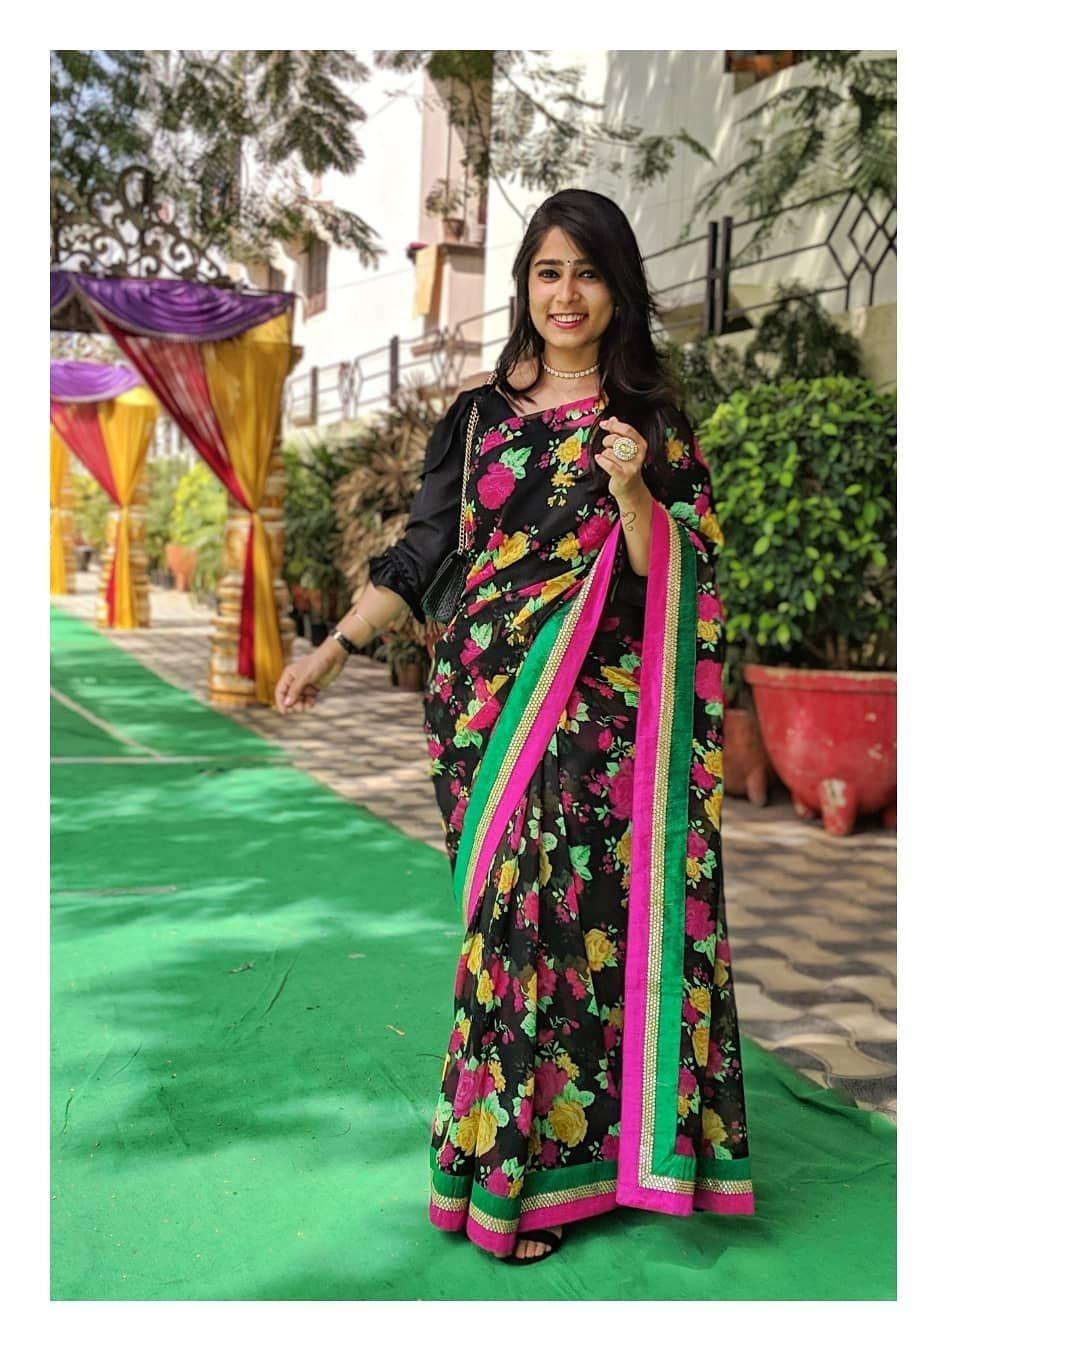 saree ootd somystyles saree traditional dresses fashion